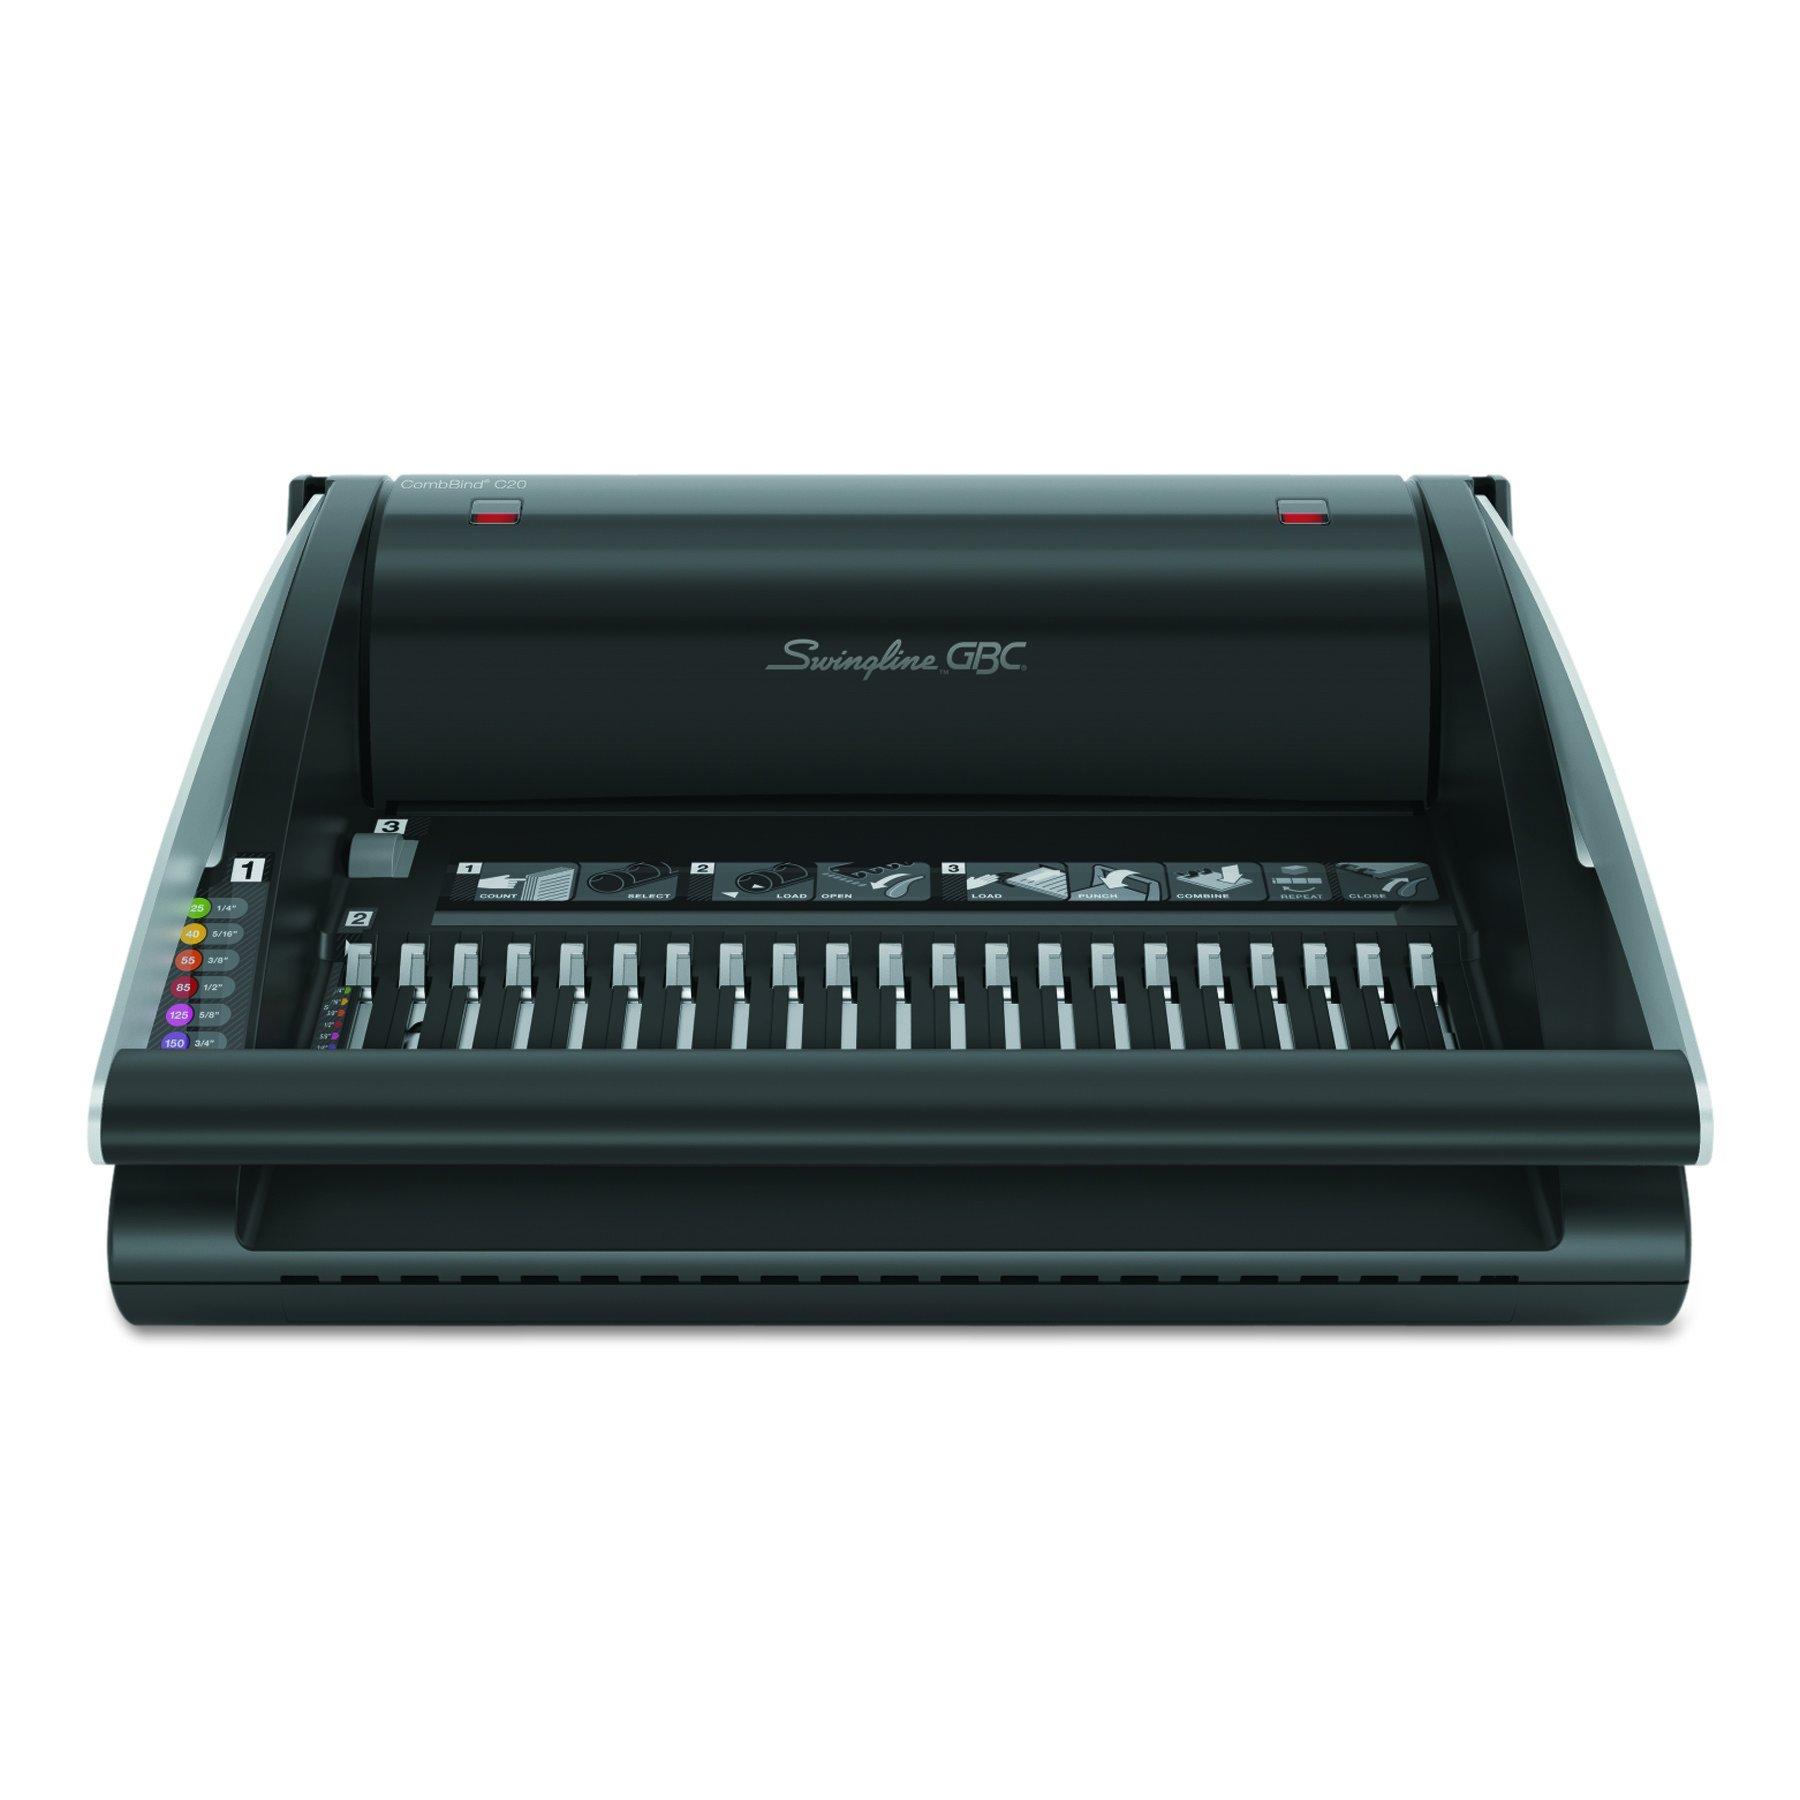 Swingline GBC Binding Machine, 20 Sheet Punch Capacity, 320 Sheet Binding Capacity, CombBind C20 (7706172)